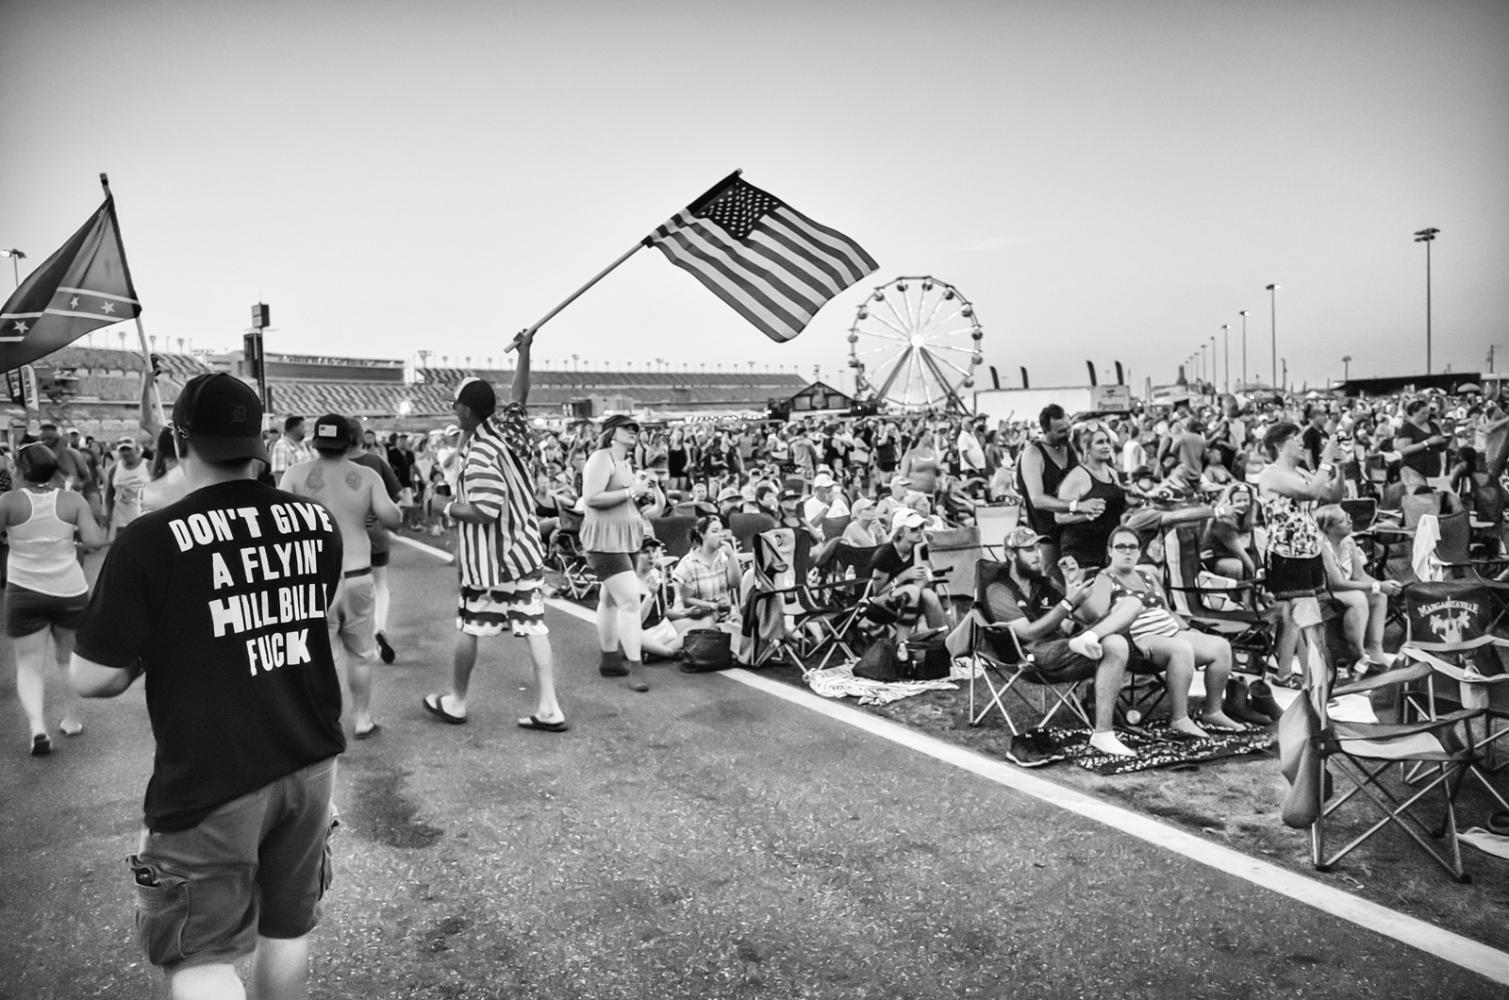 Hillbilly F__k Country 500 music fest. Daytona Int'l Speedway